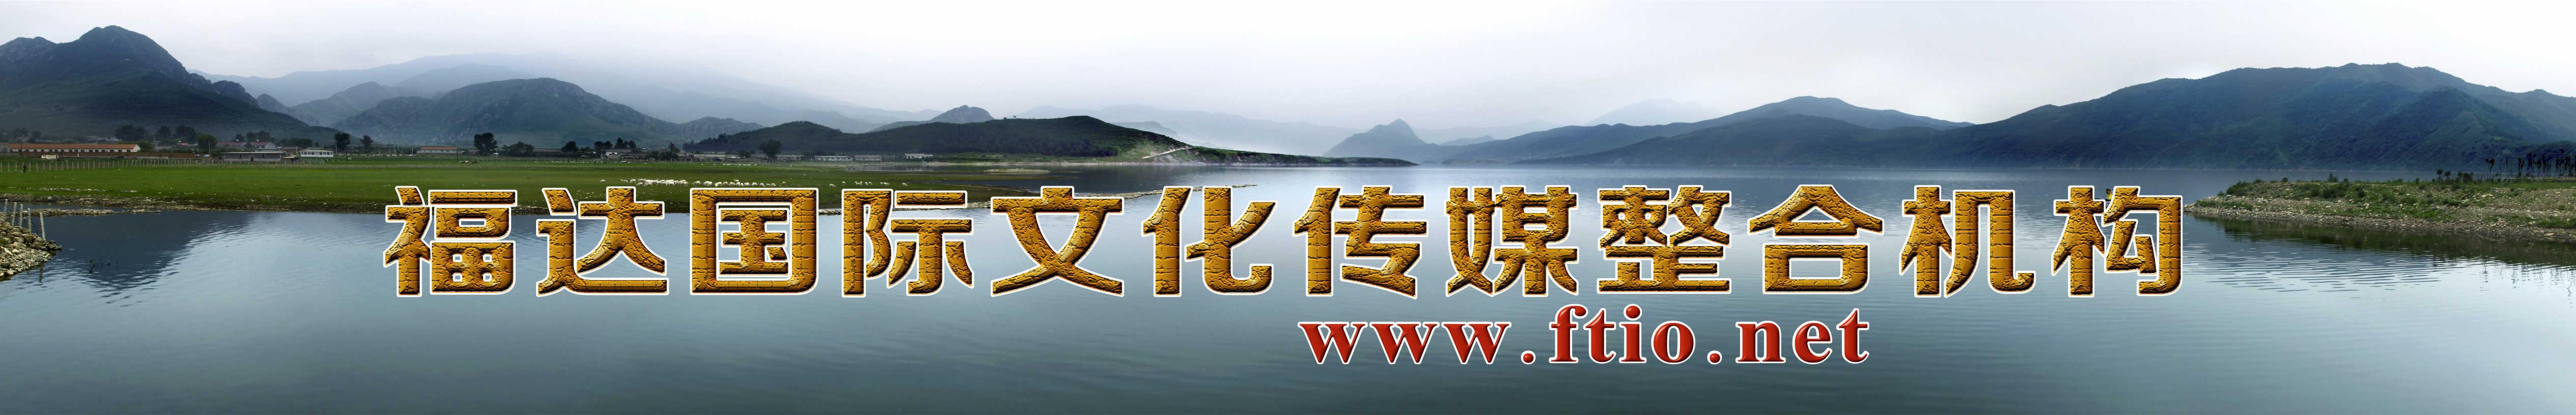 福达国际影视 banner